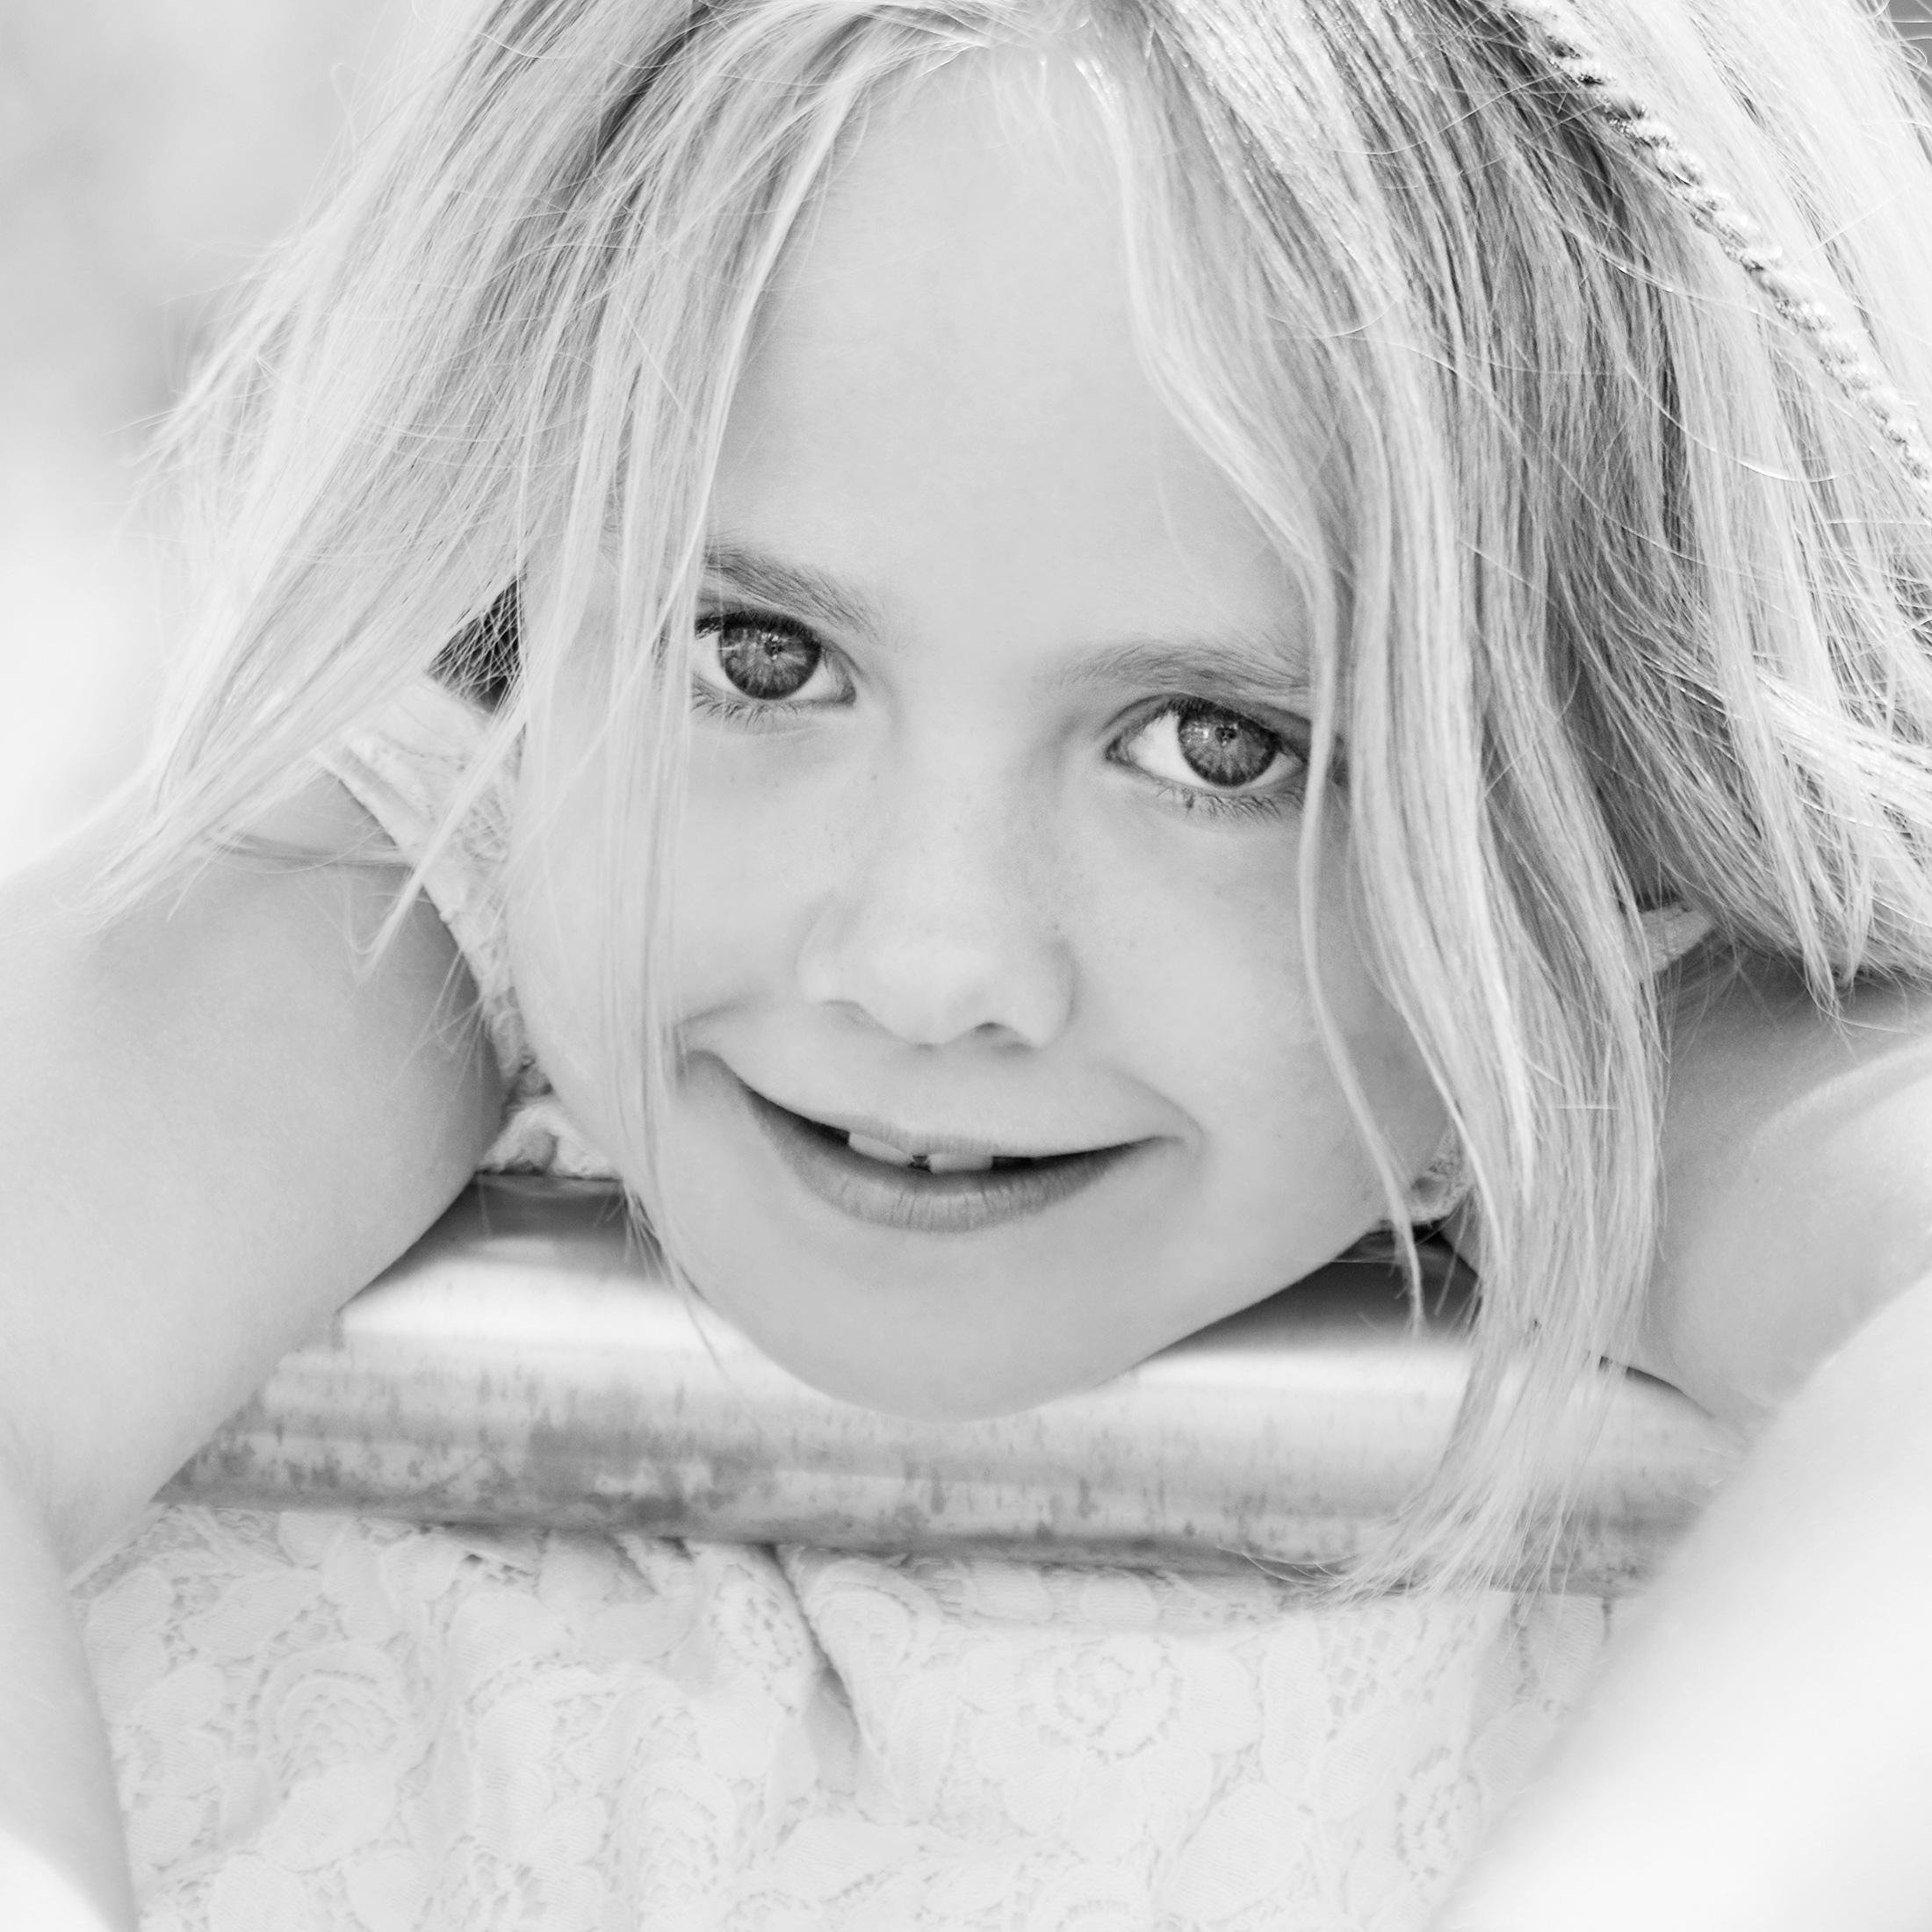 Rikke_Maj_V622_KARIN_KVADRAT_STOR_WEB.jpg